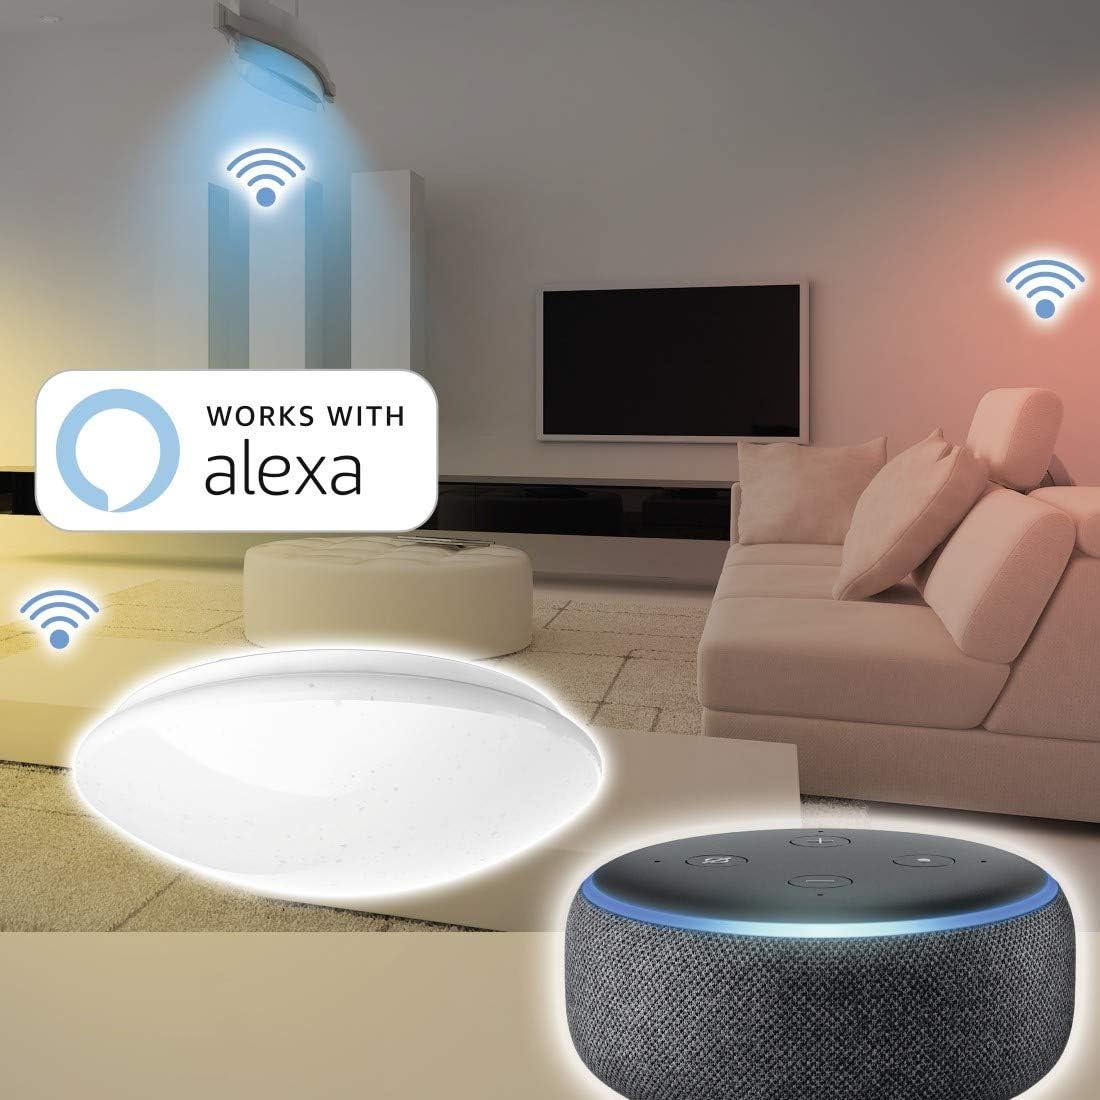 Hama Wi-Fi LED Deckenleuchte, kompatibel mit Alexa/Google Home (ohne Hub,  dimmbar, Ø 4cm, App-/Sprachsteuerung, zB per Echo Dot,